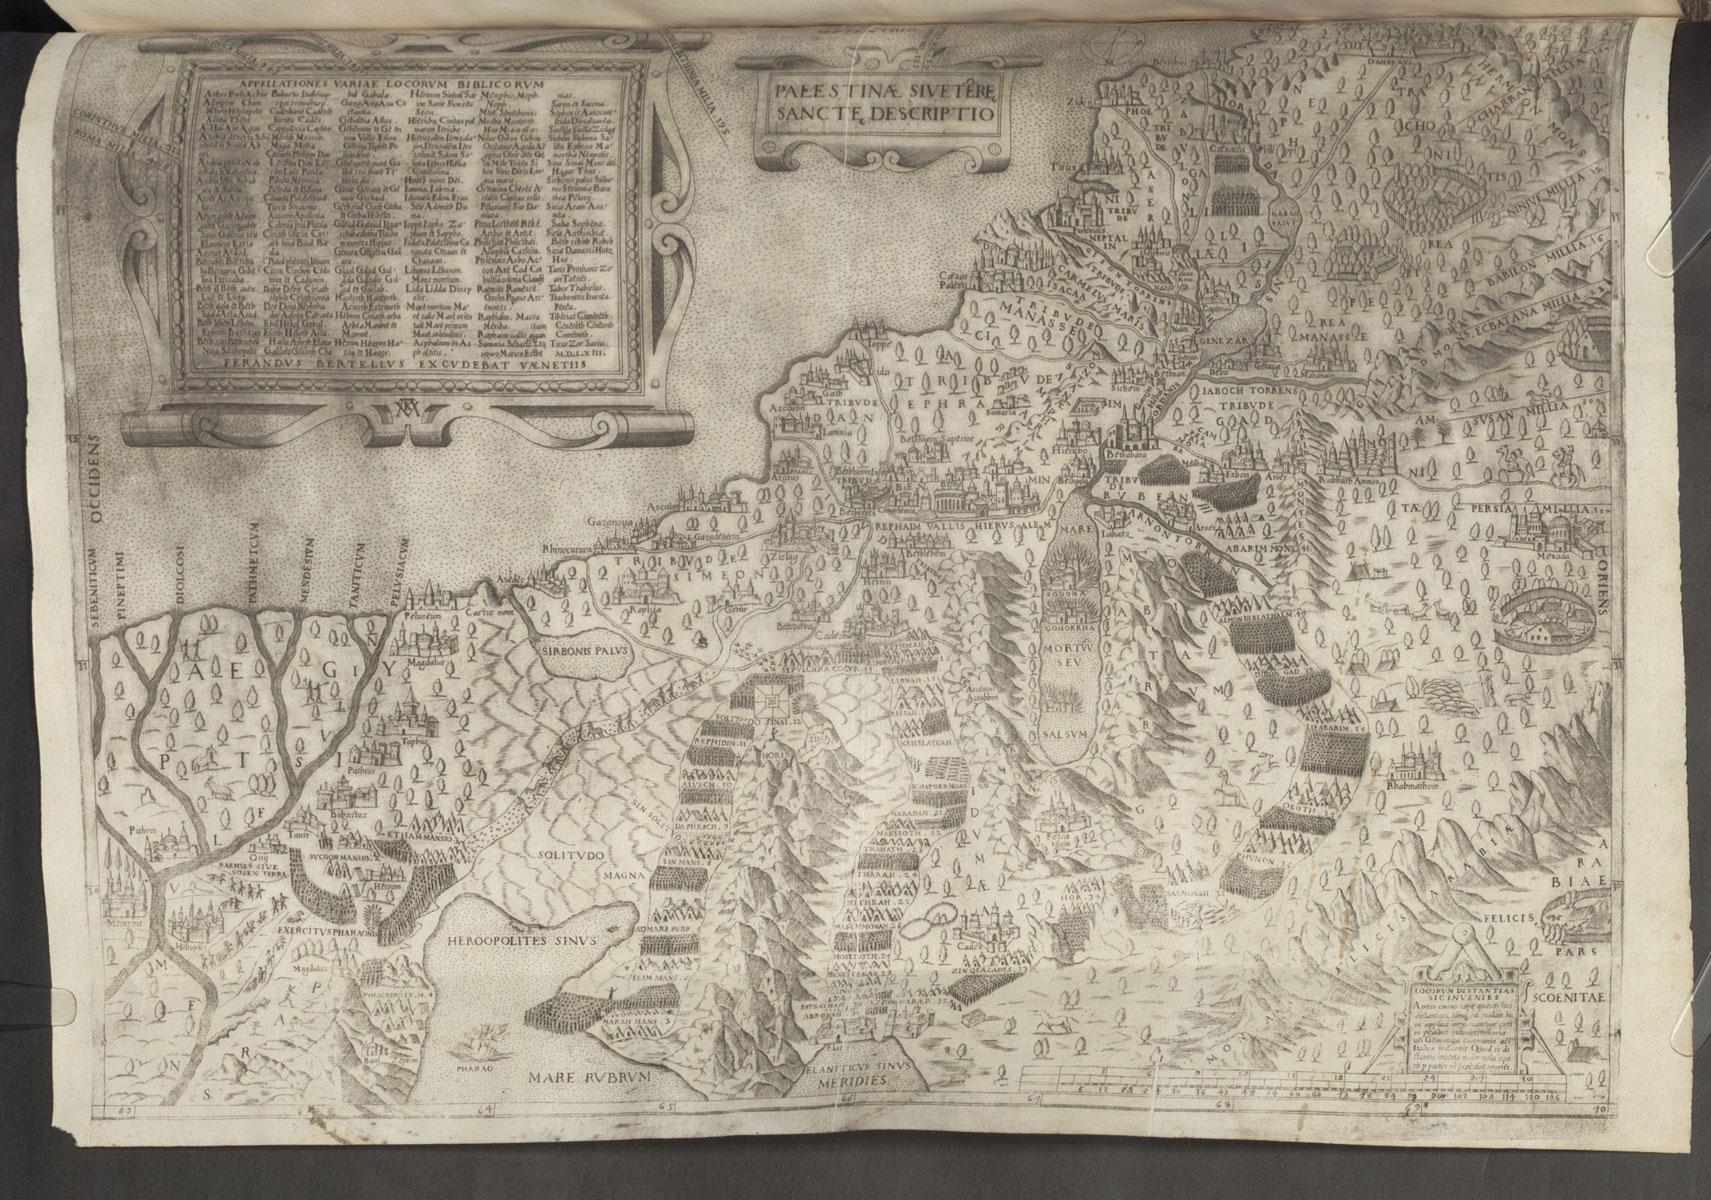 Ferdinando Bertelli / Mario Cartaro, Palestinae Sive Terrae Sanctae Descriptio, Venedig, 1563, Kupferstich auf Papier, 50 x 37 cm; Bayerische Staatsbibliothek